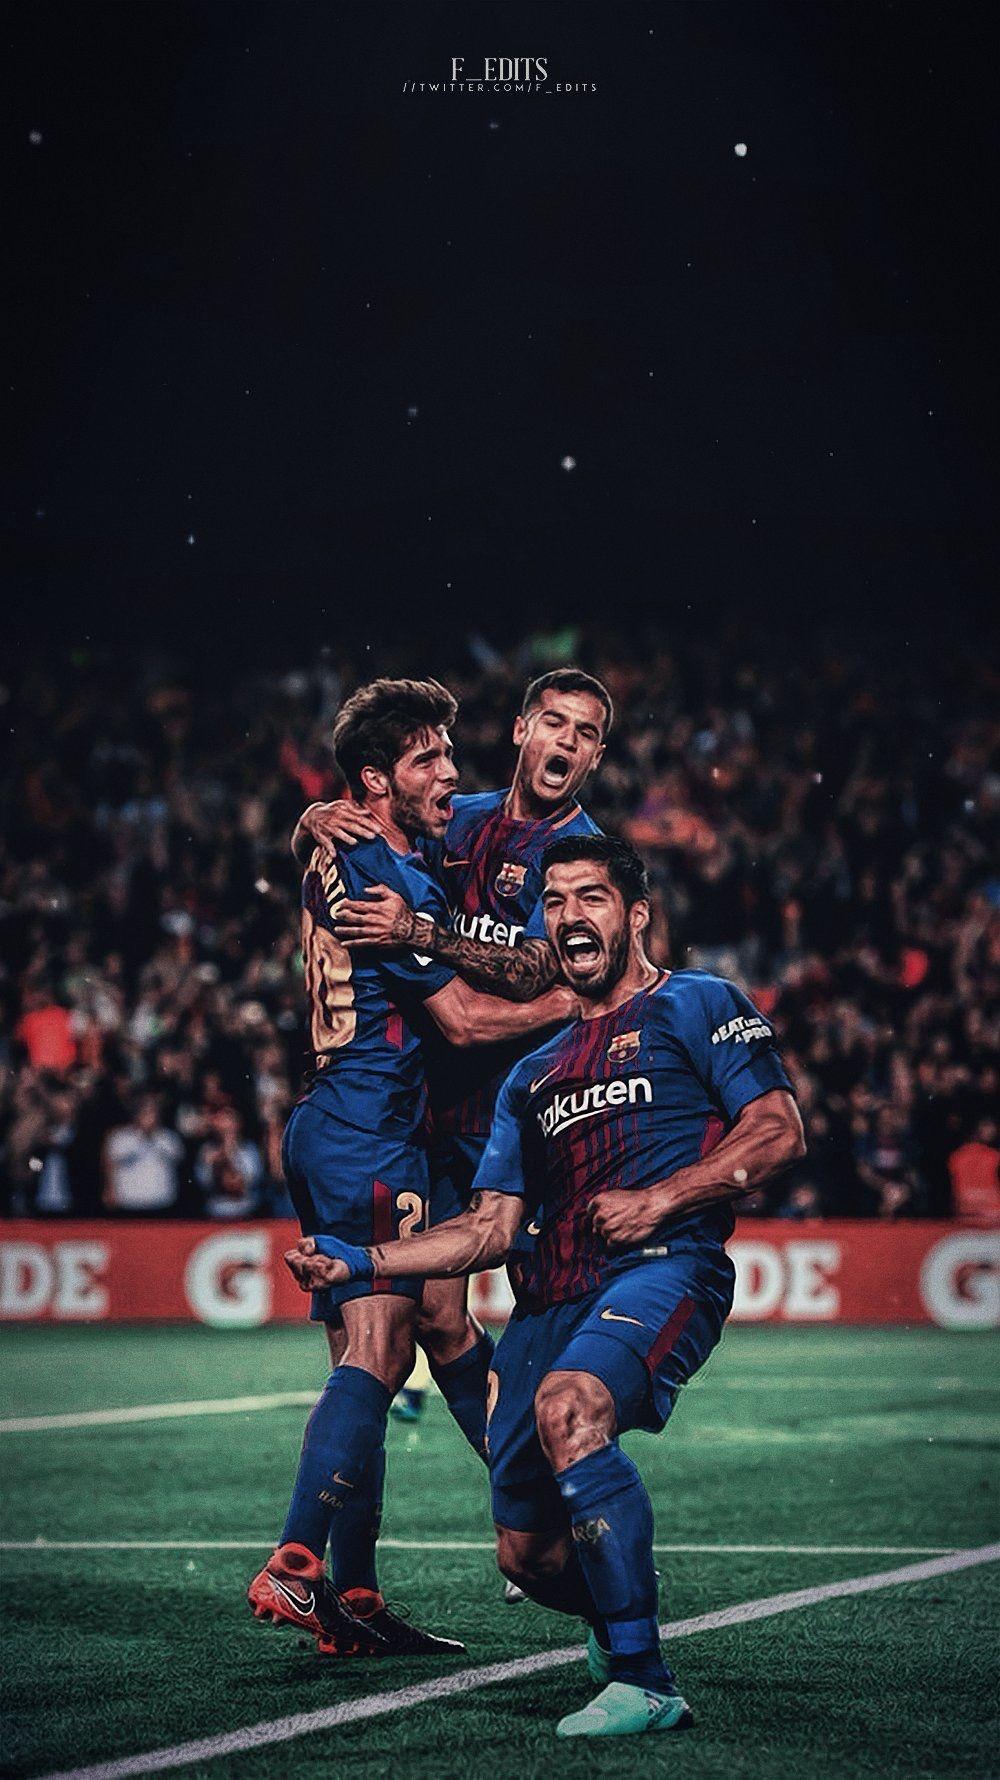 Pin em ⚽️ European Top Leagues ⚽️ | ⚽️ UEFA Champions ...